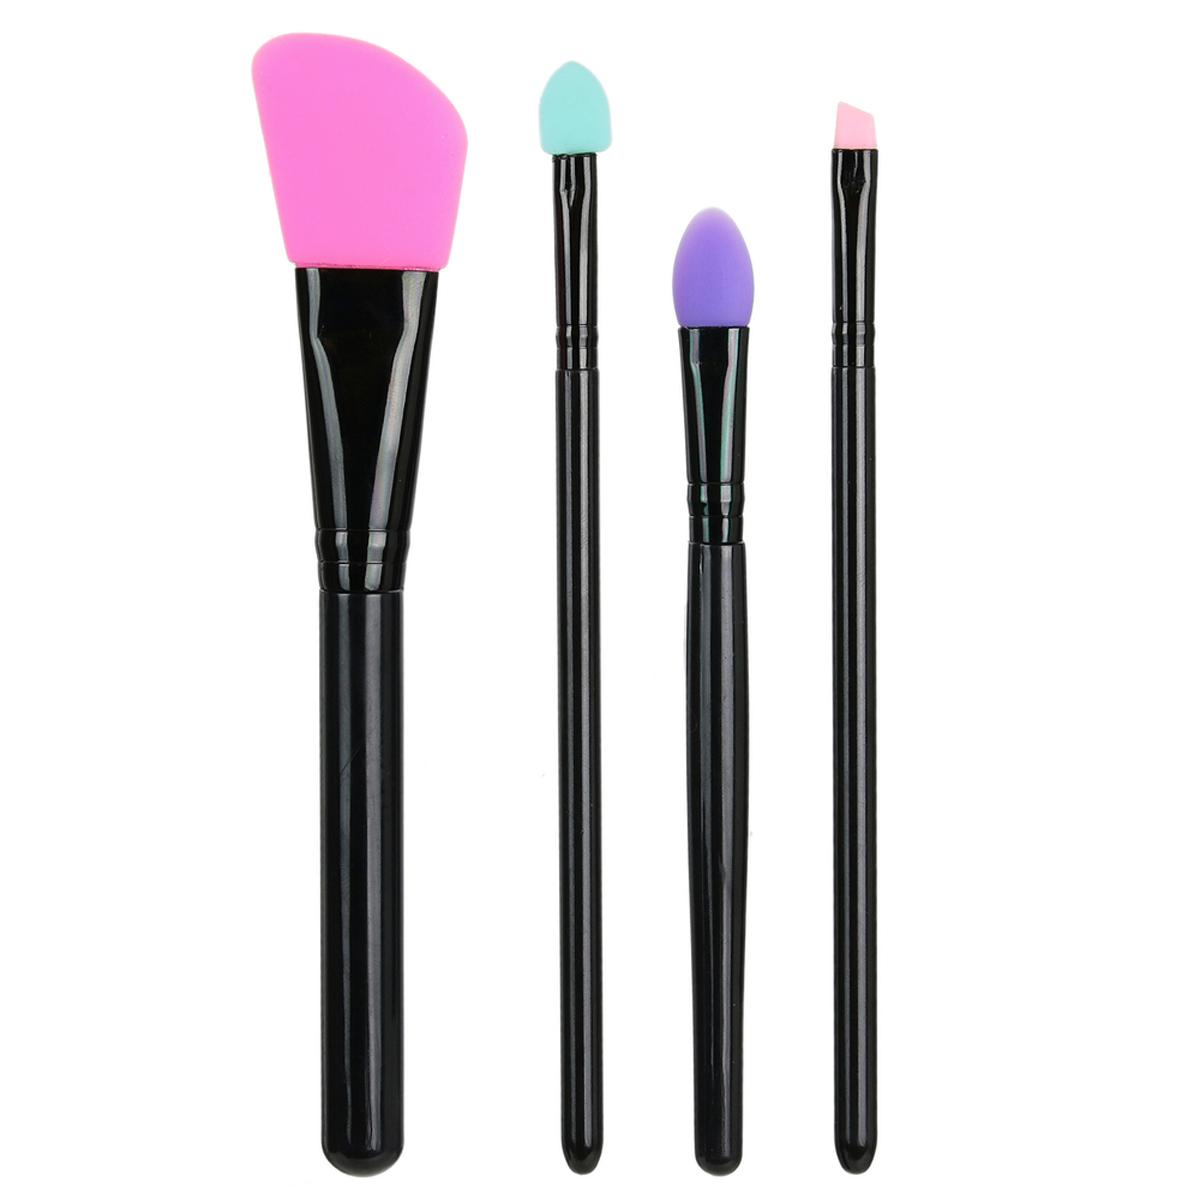 4 pinceaux de maquillage silicone \'Scarlett\' - 16x6 cm - [A1779]